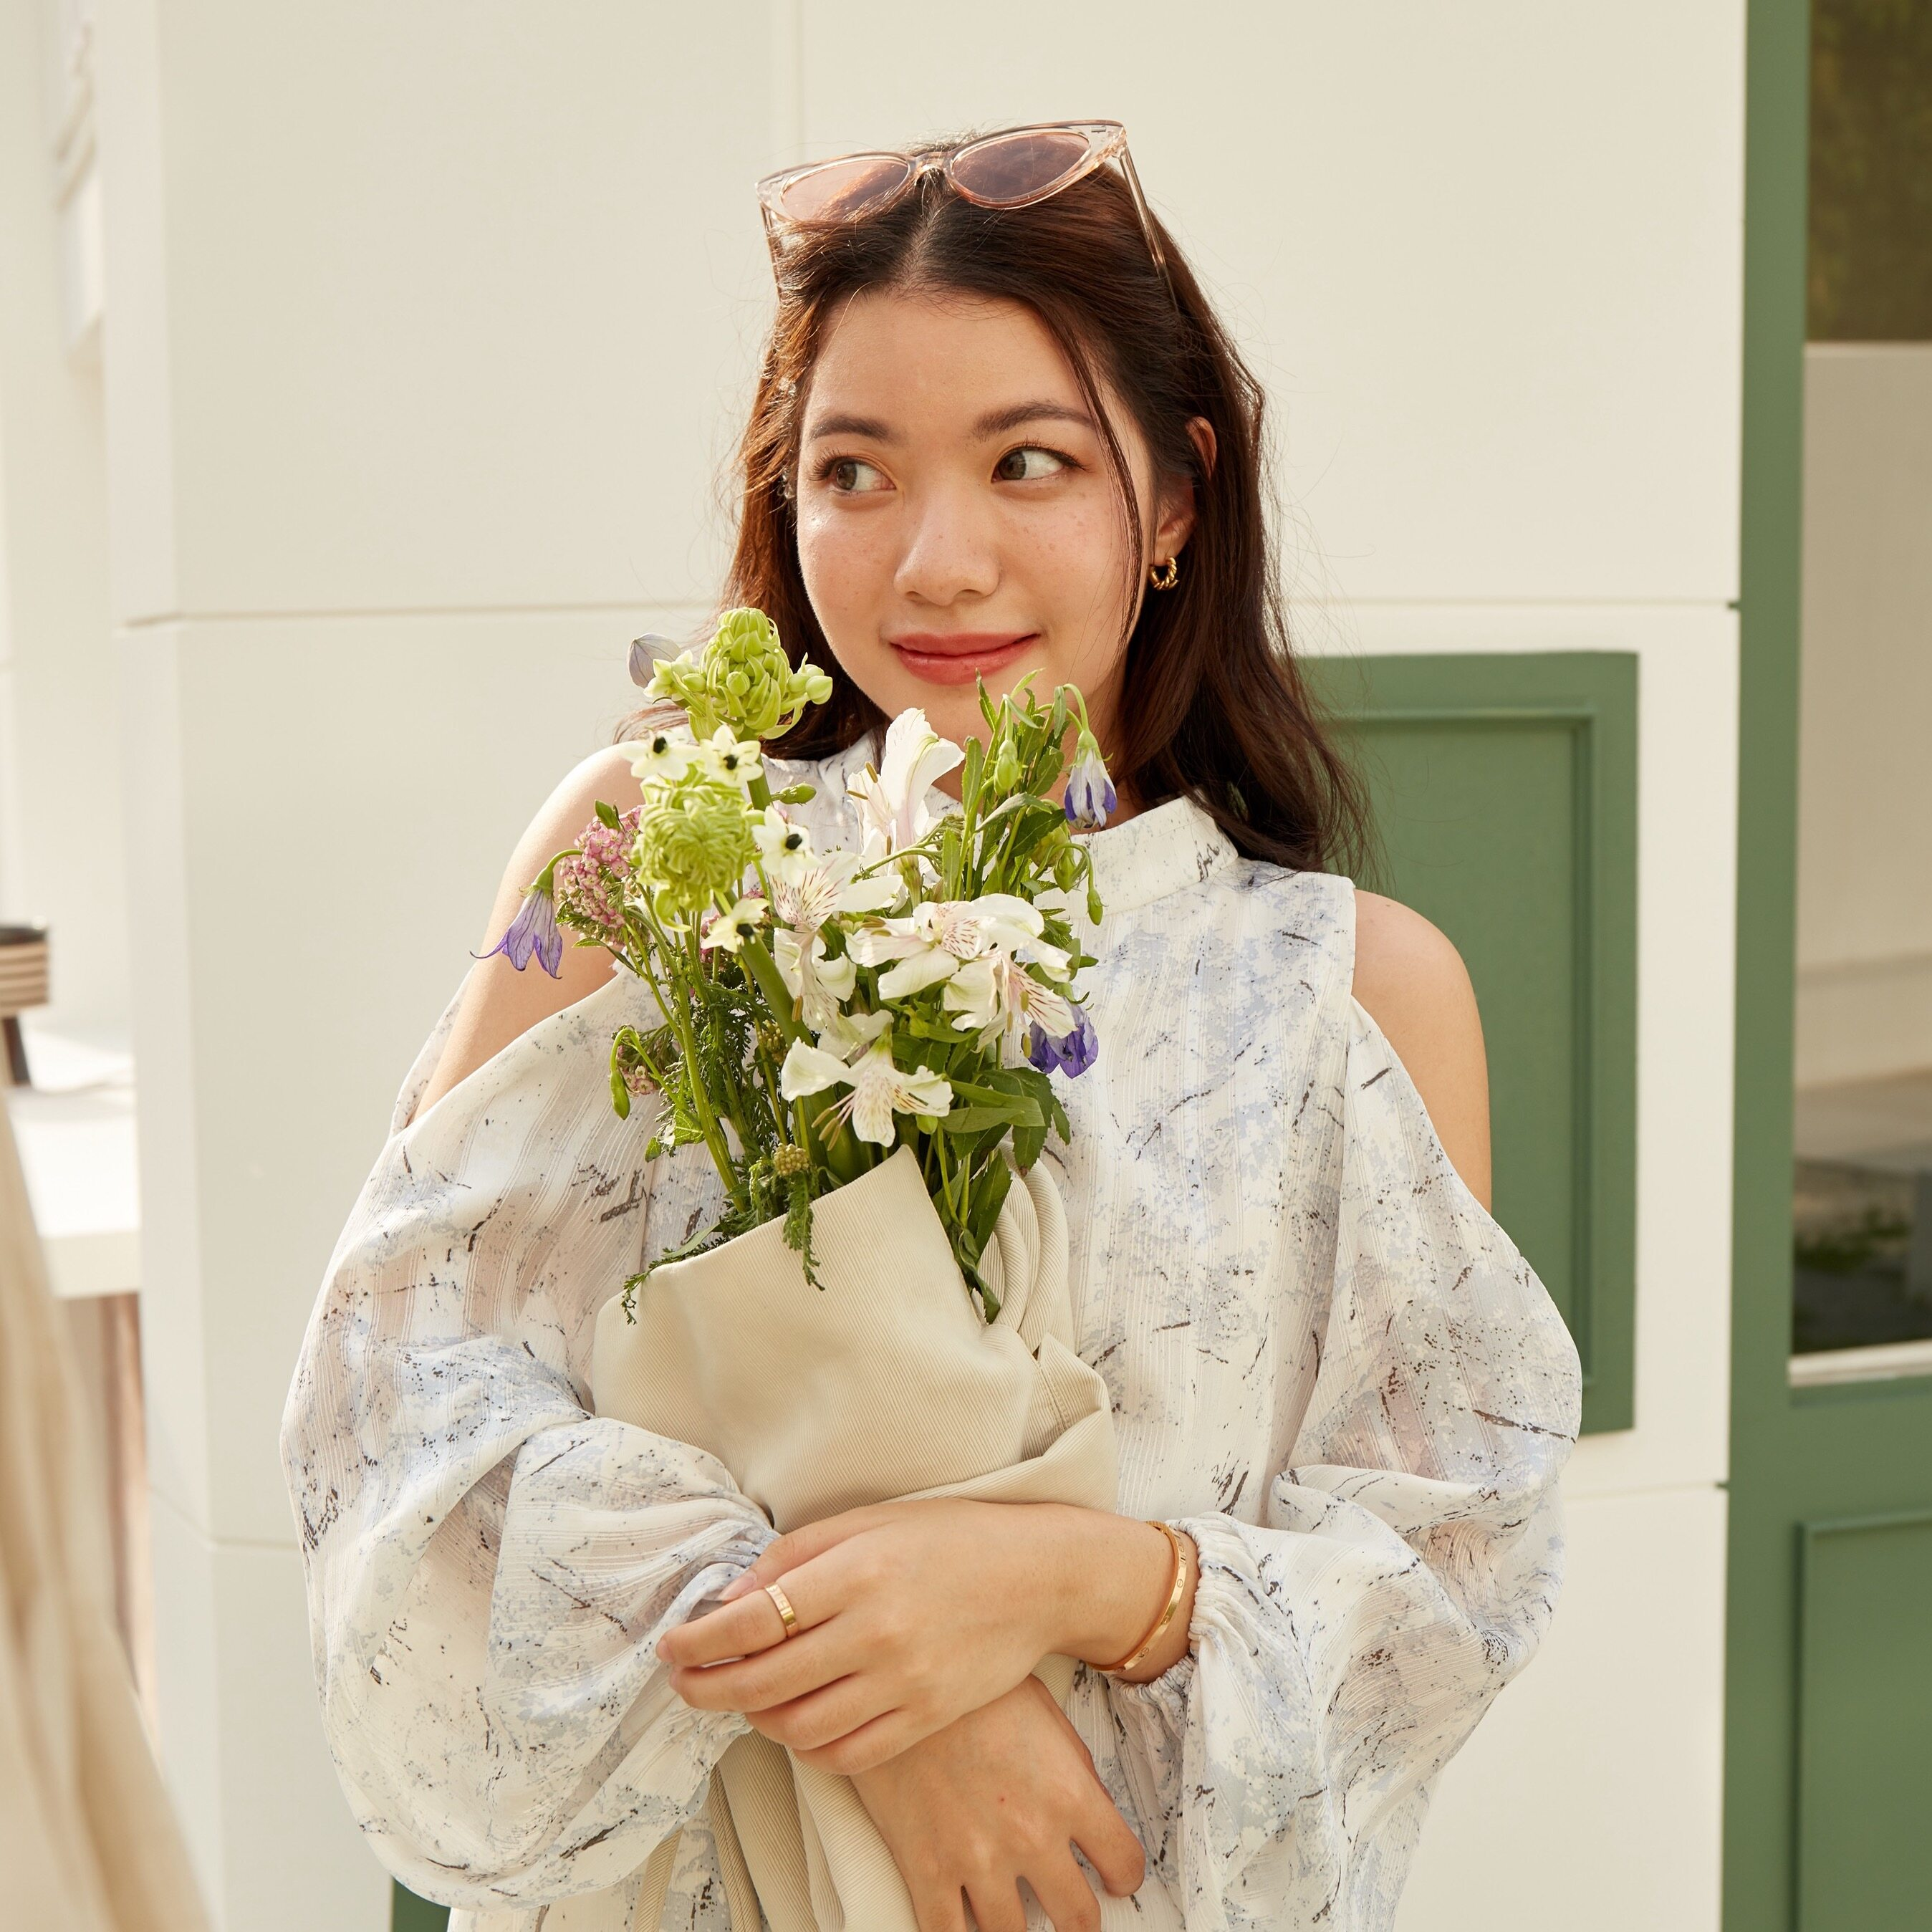 Lookbooklookbook Jessica Top Blue Blossom เสื้อแขนยาว เว้าไหล่ สีฟ้า.